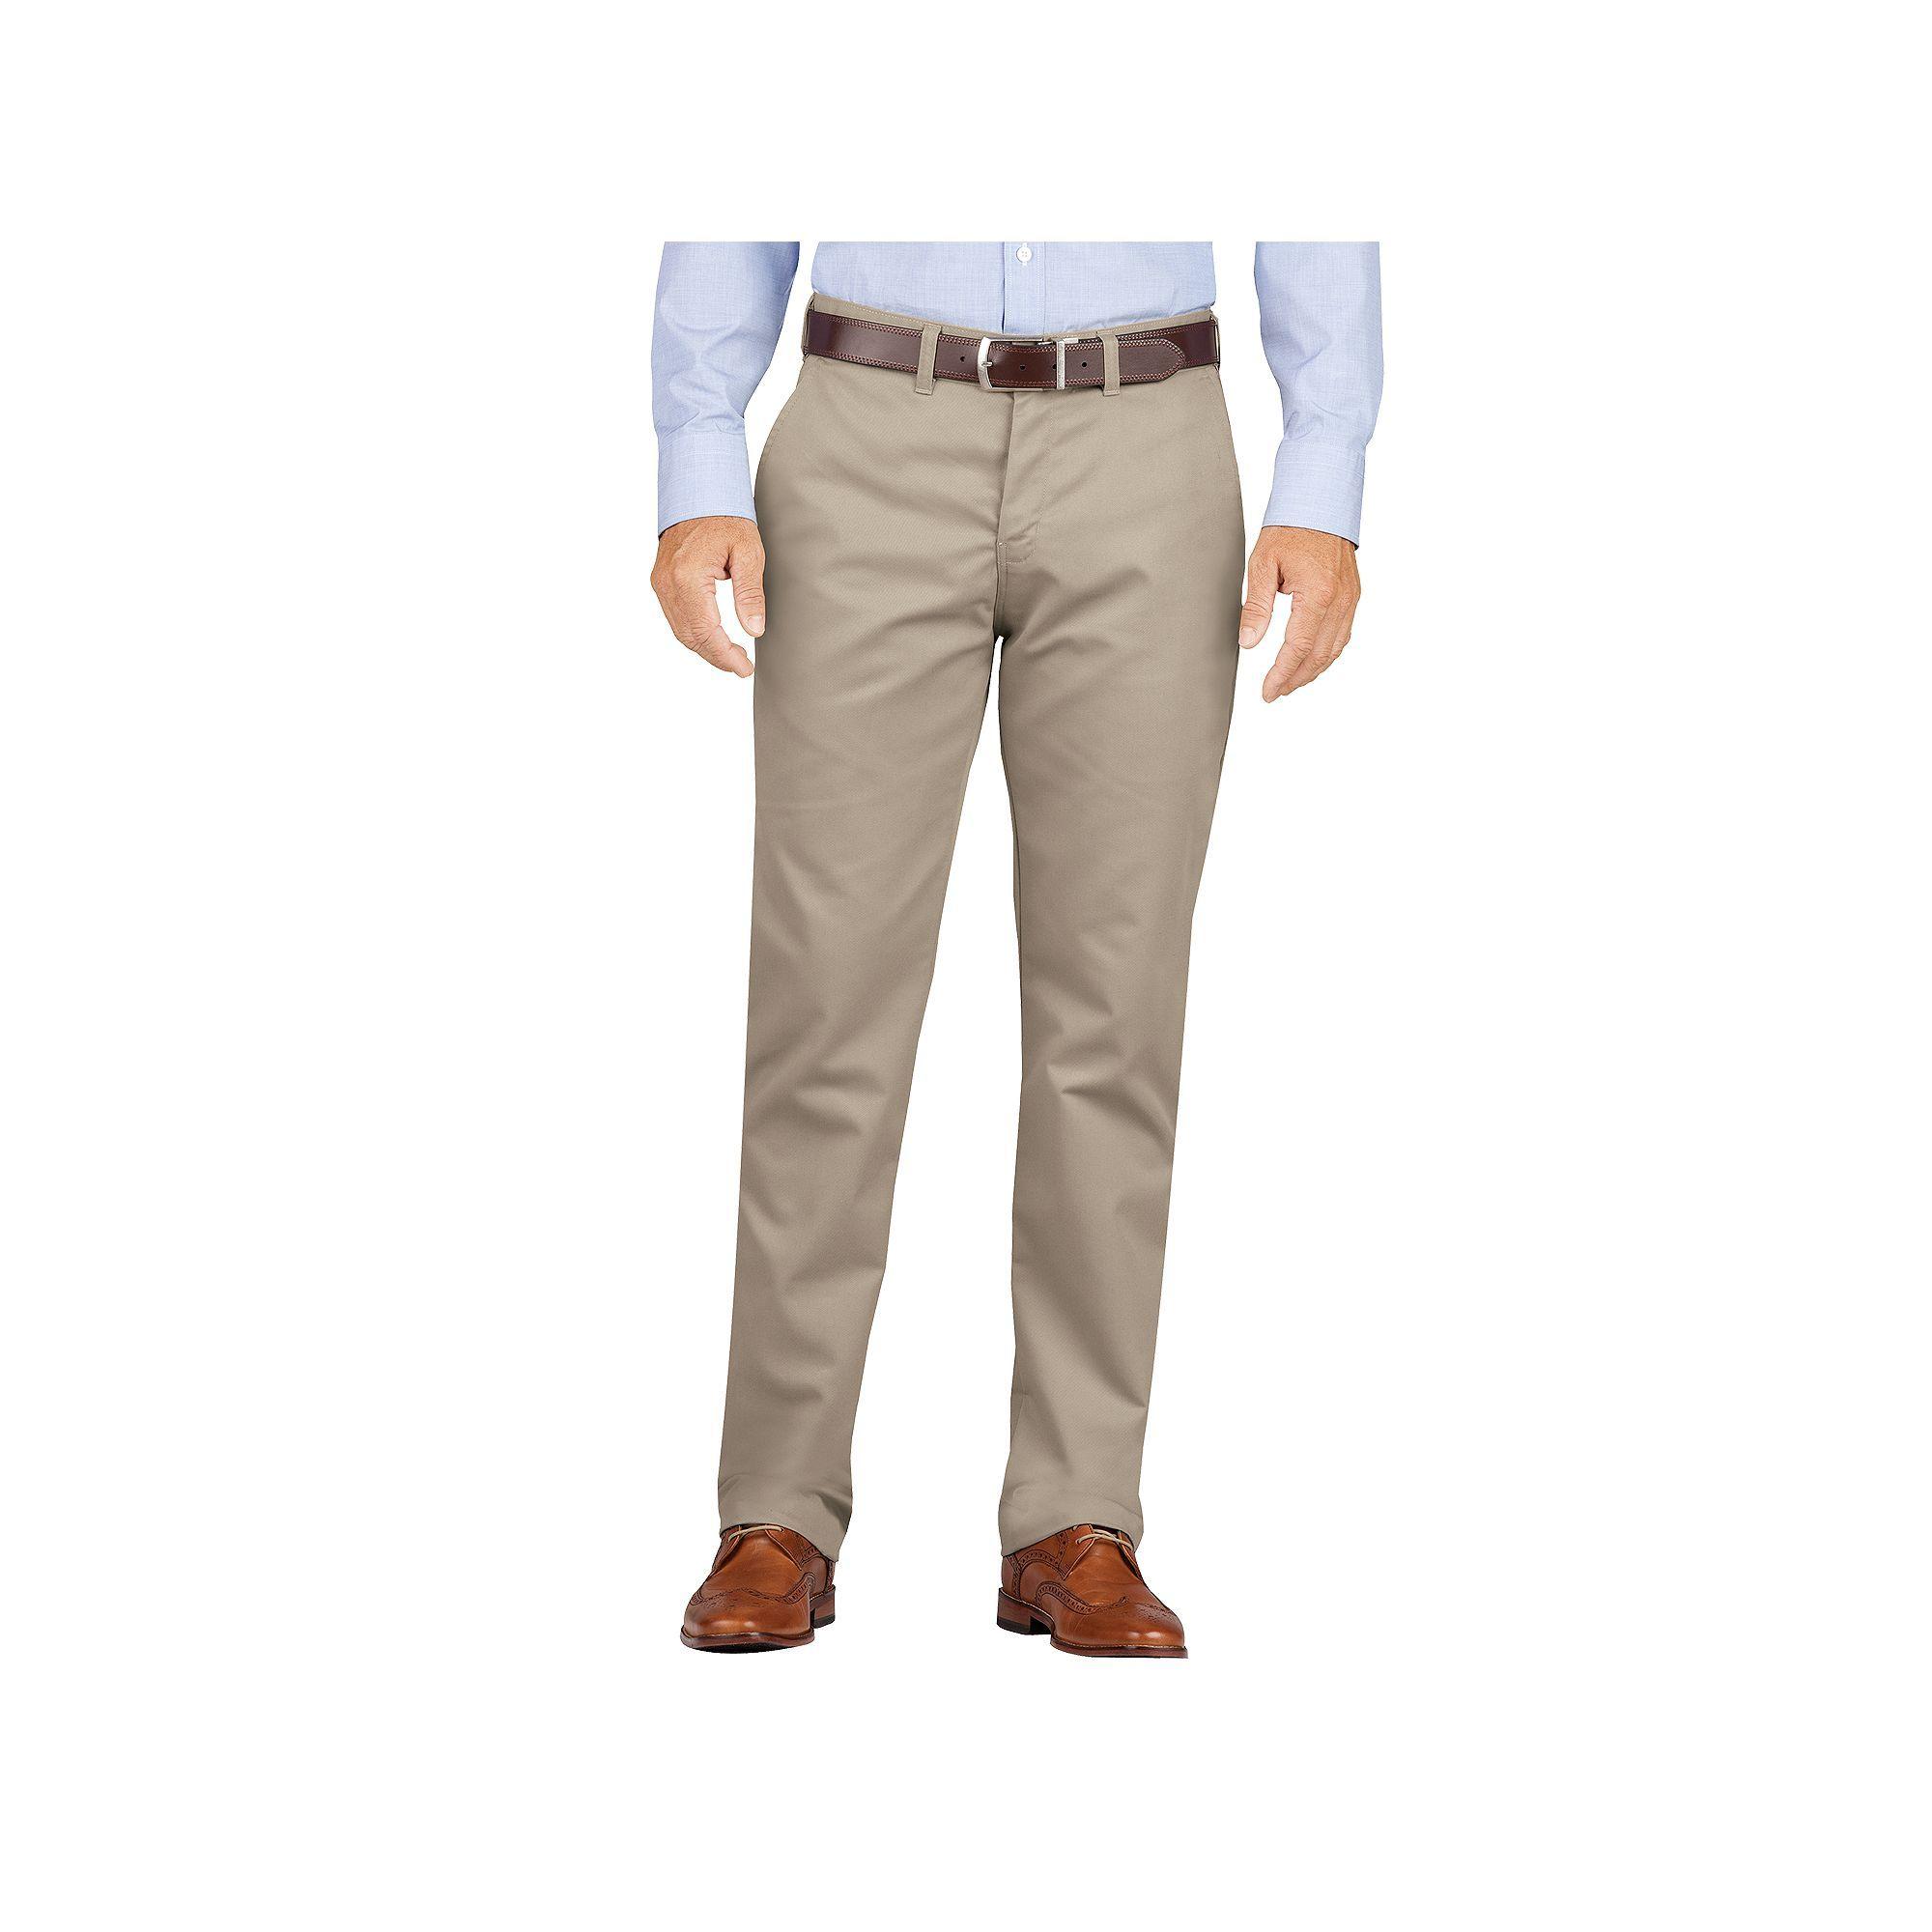 Dickies Men s Slim-Fit Wrinkle-Resistant Khaki Dress Pants ... 6e6ce946a